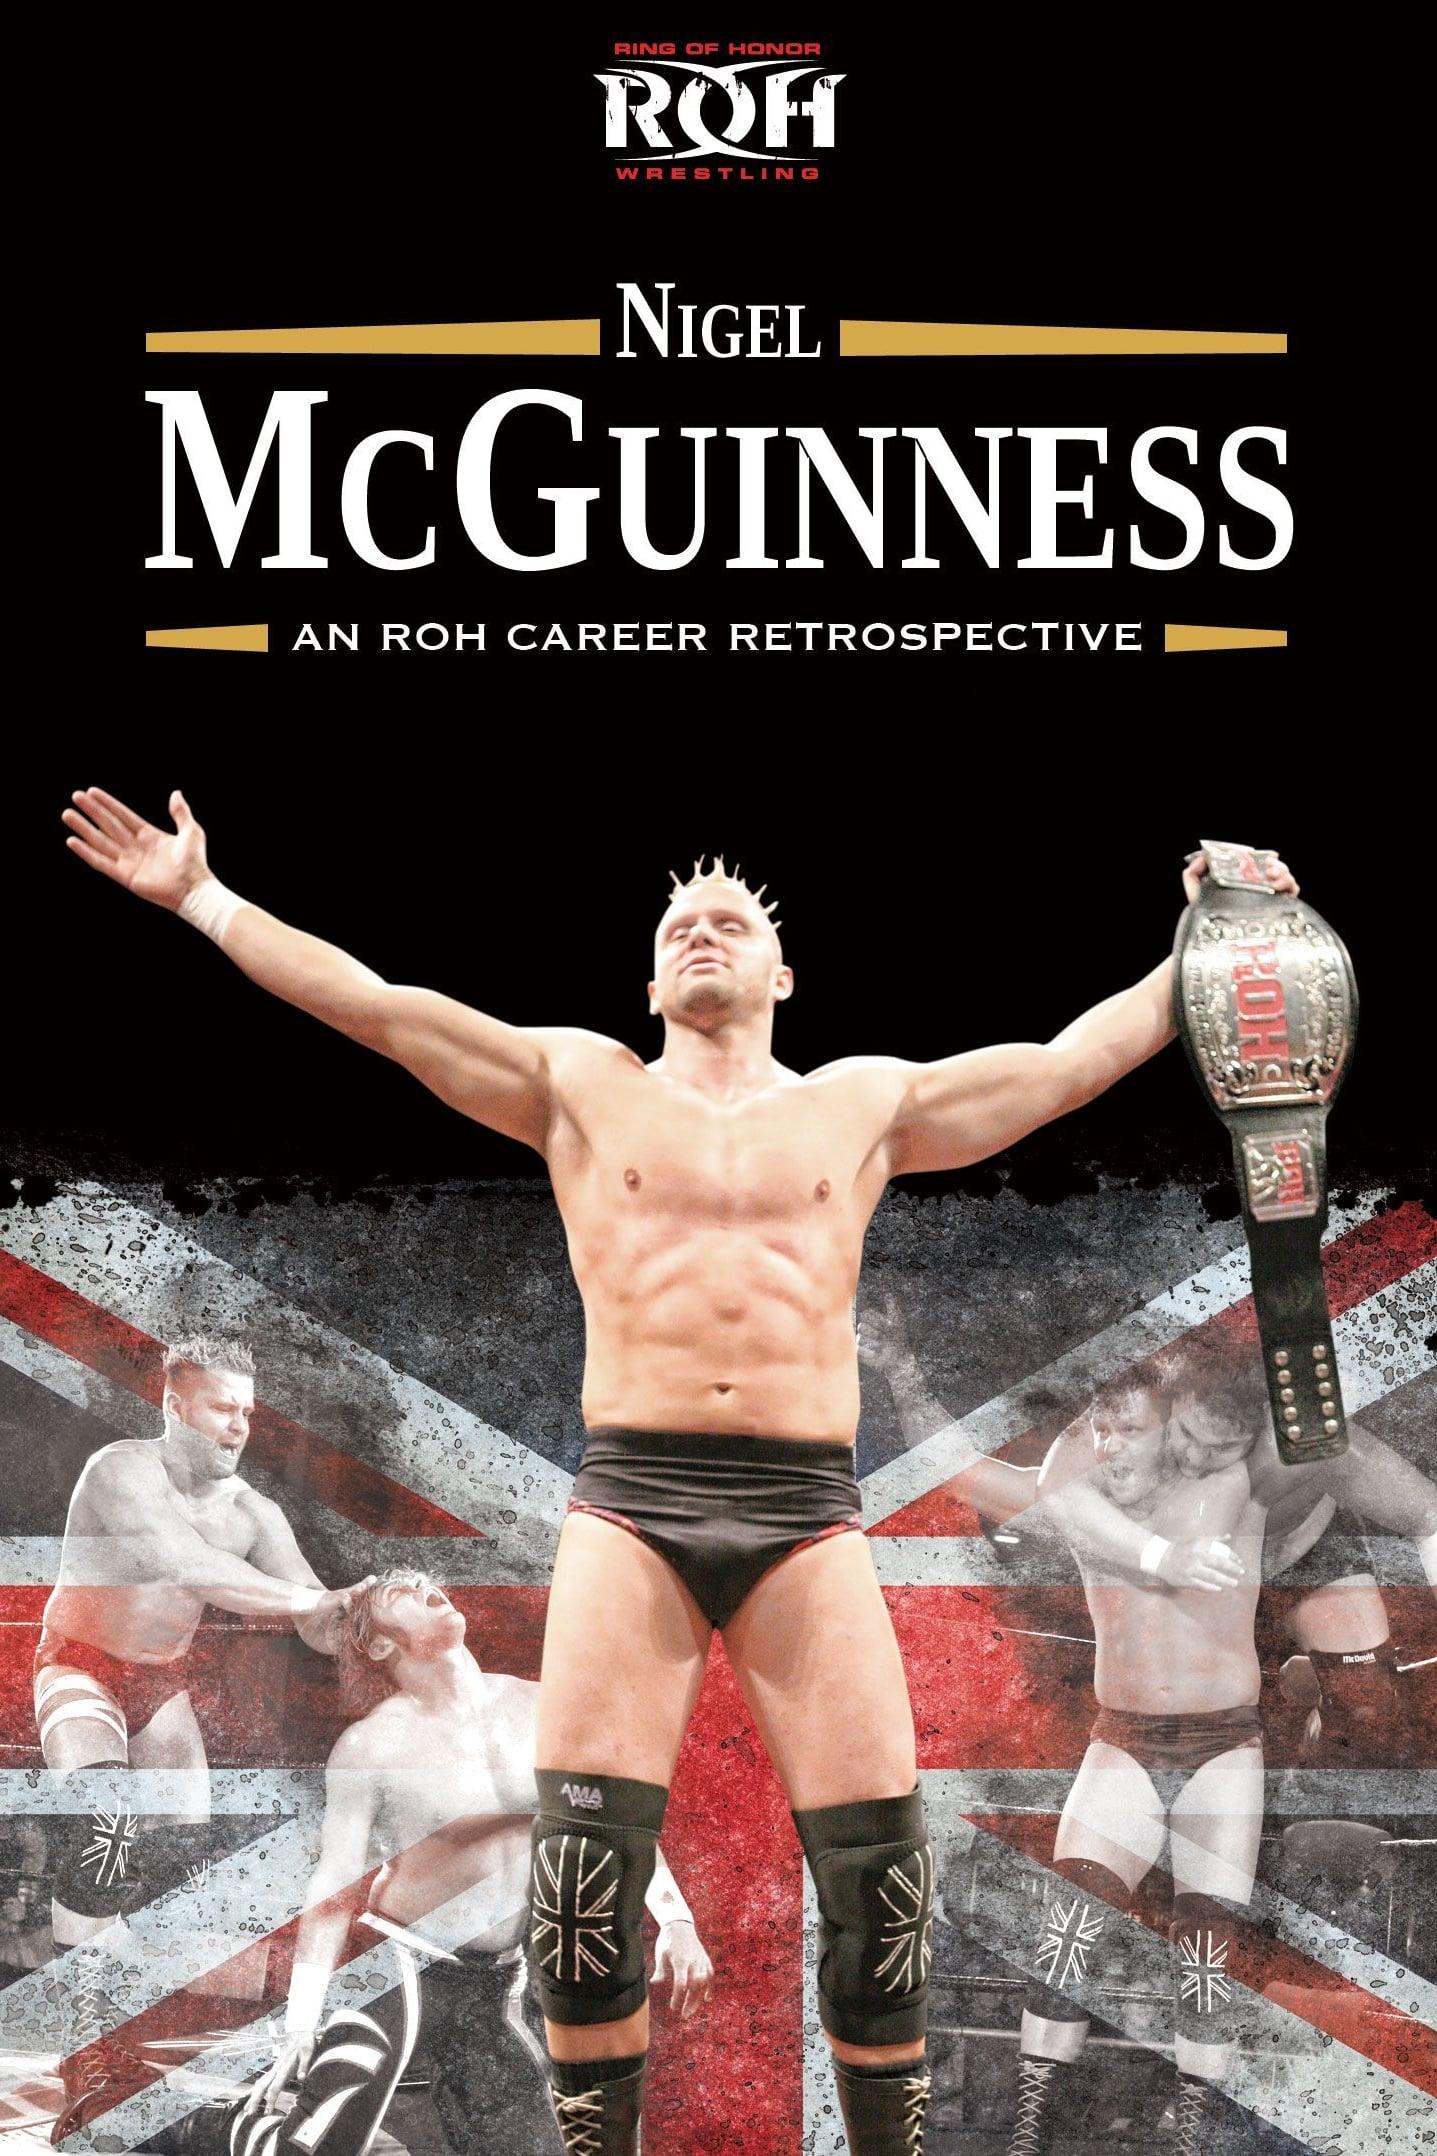 Nigel McGuinness: An ROH Career Retrospective